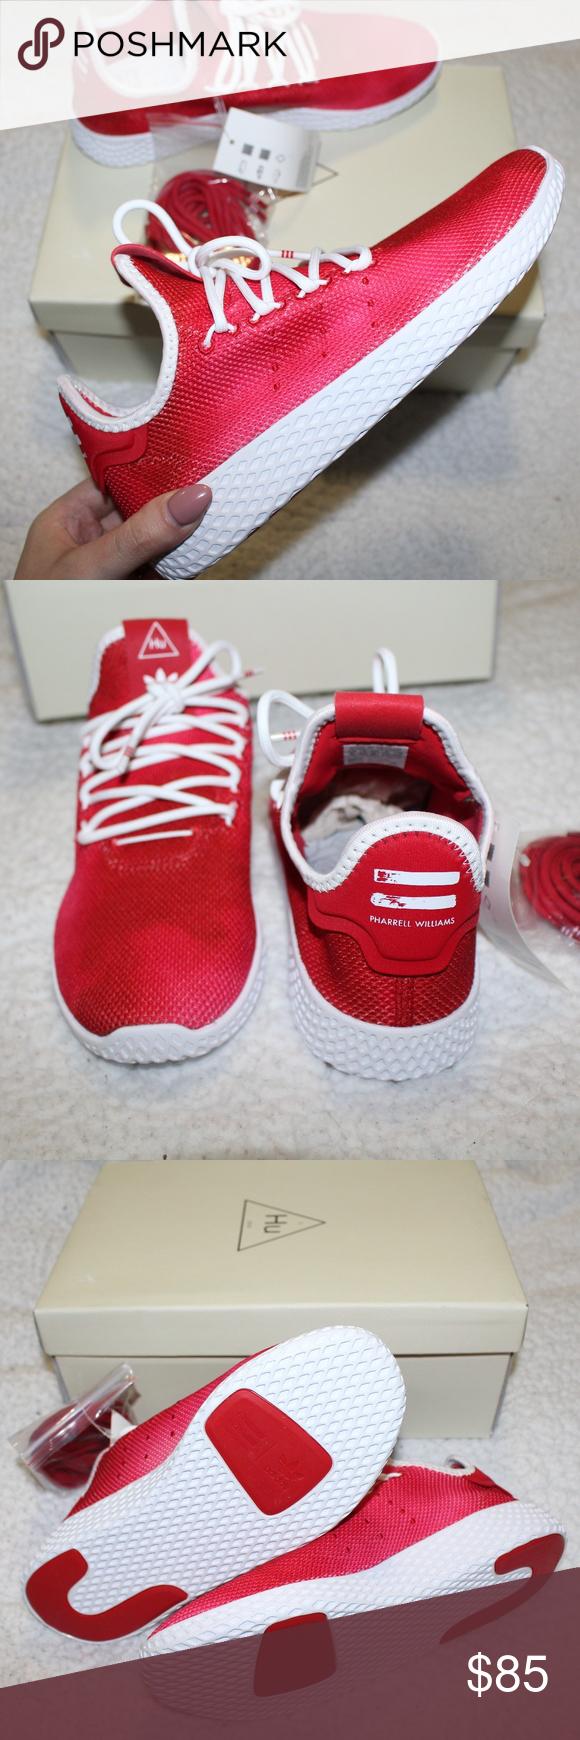 61fbe888ebaa7 BNIB adidas x Pharrell Tennis HU Shoes Youth adidas x Pharrell Williams  Scarlet Tennis HU Sneakers